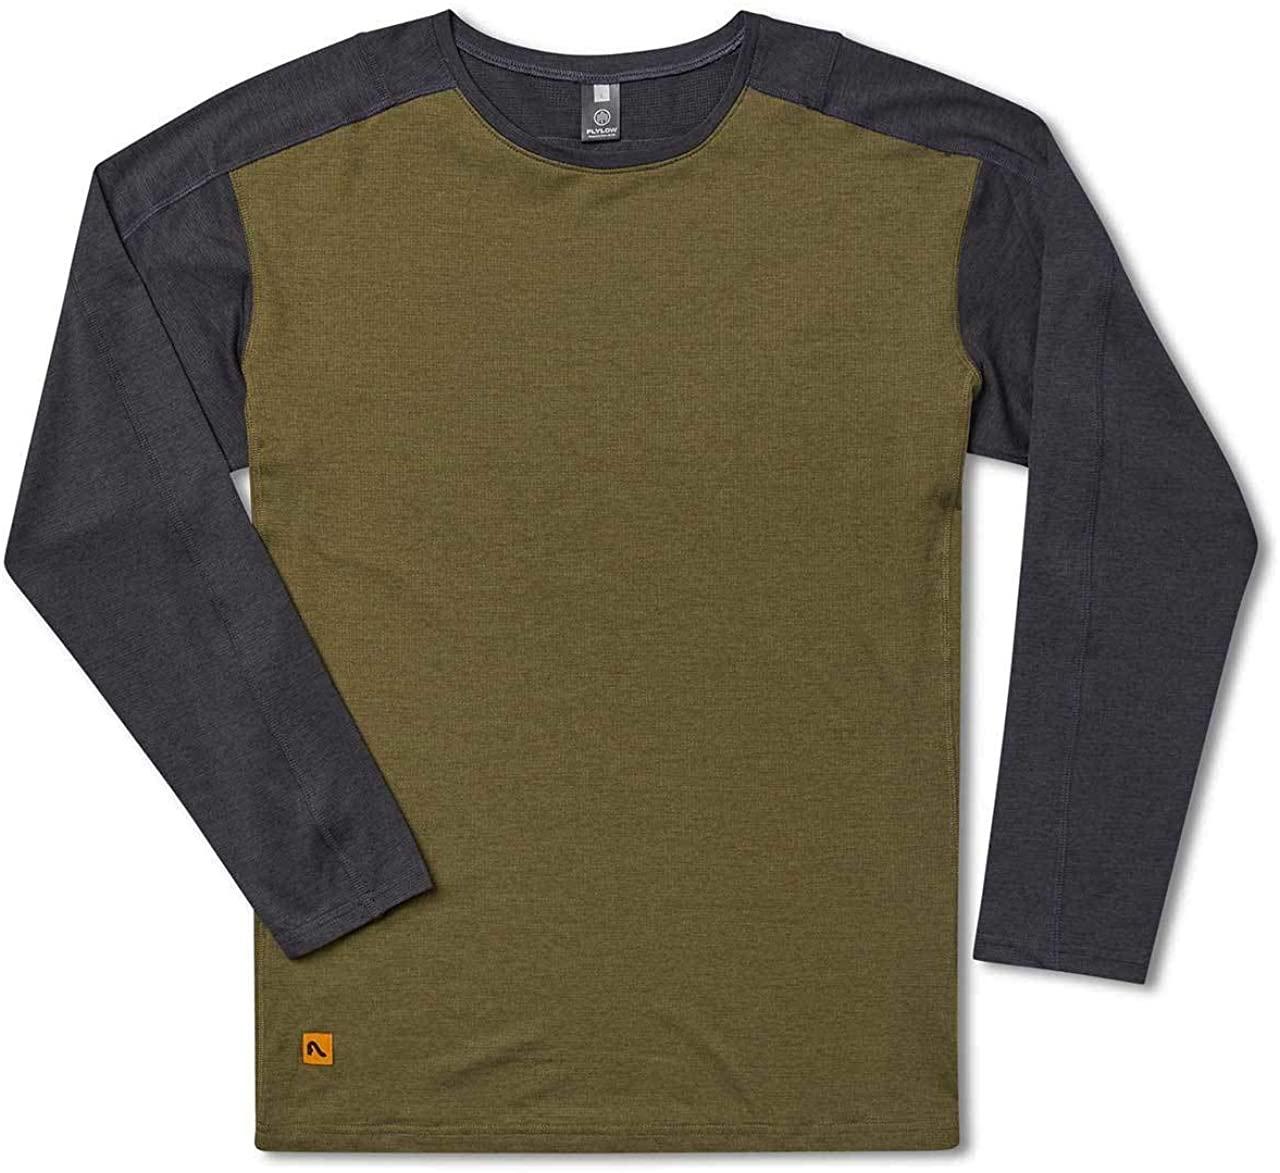 Flylow Shaw Shirt - Men's Long Sleeve Anti-Odor Treated Shirt for Hiking, Mountain Biking and Trail Running